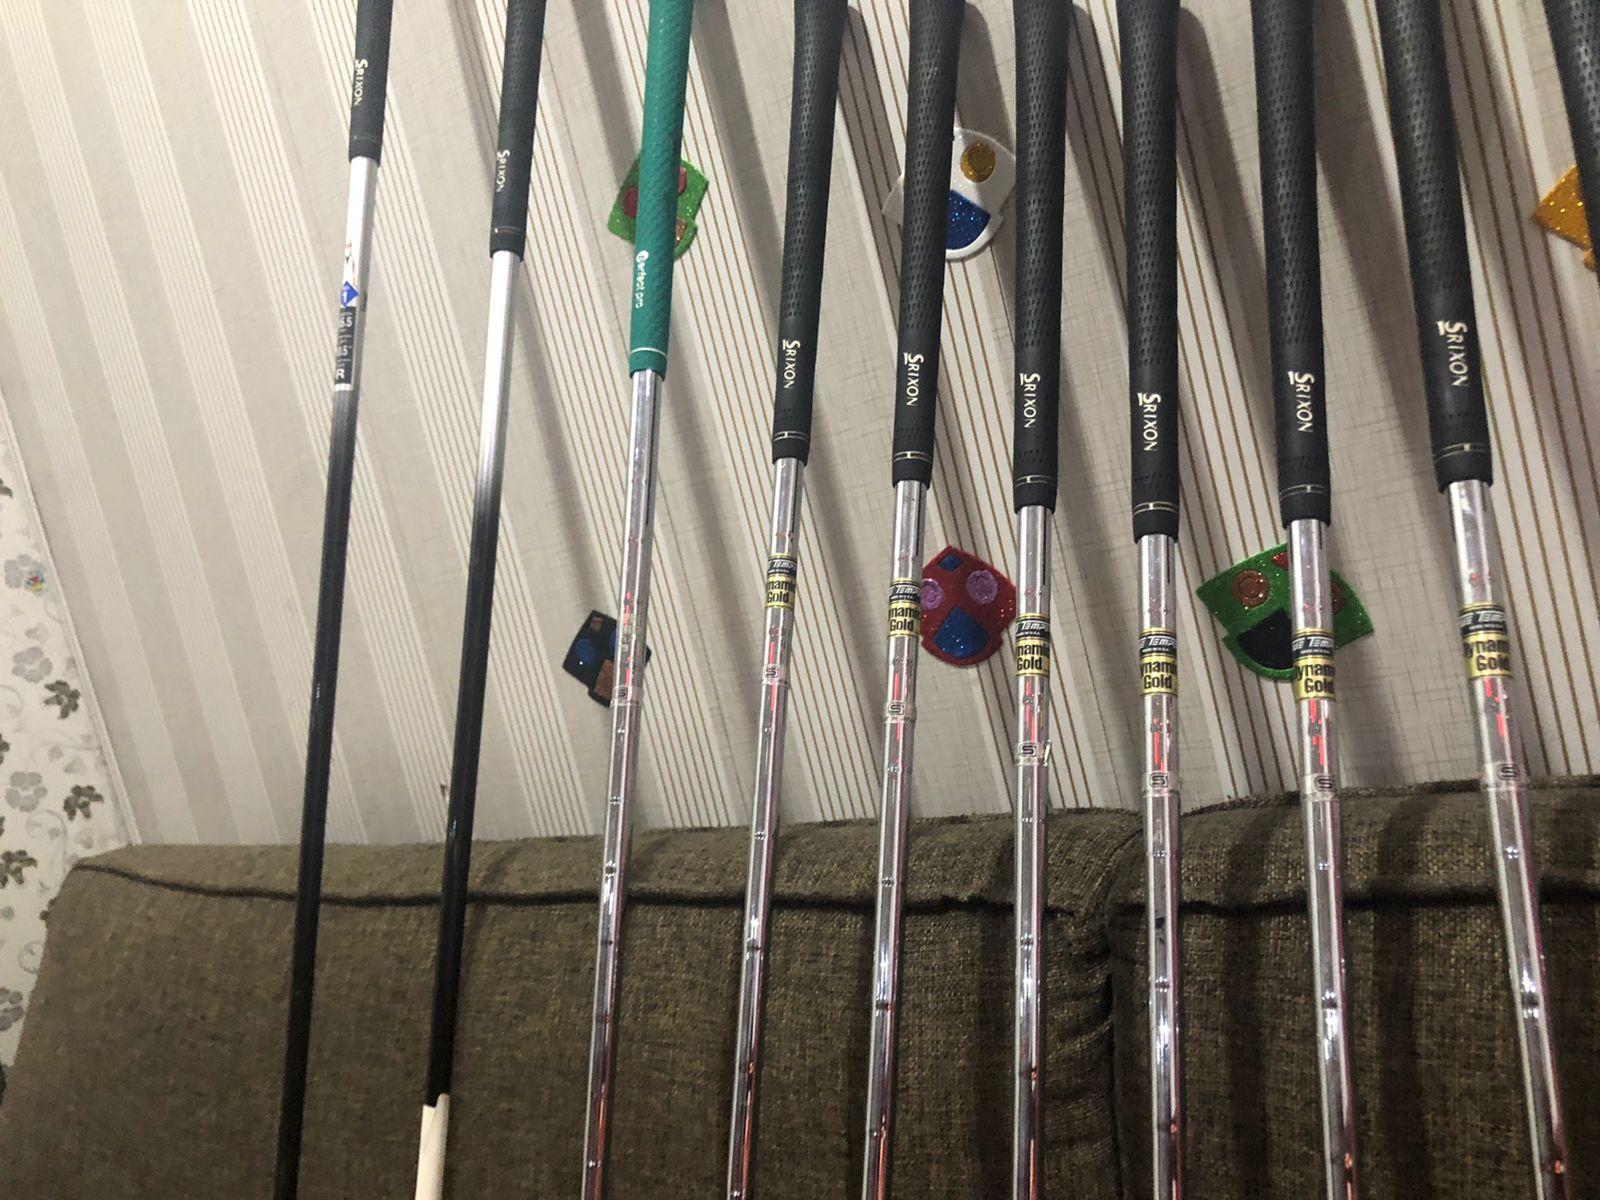 Srixon Golf Set for sale